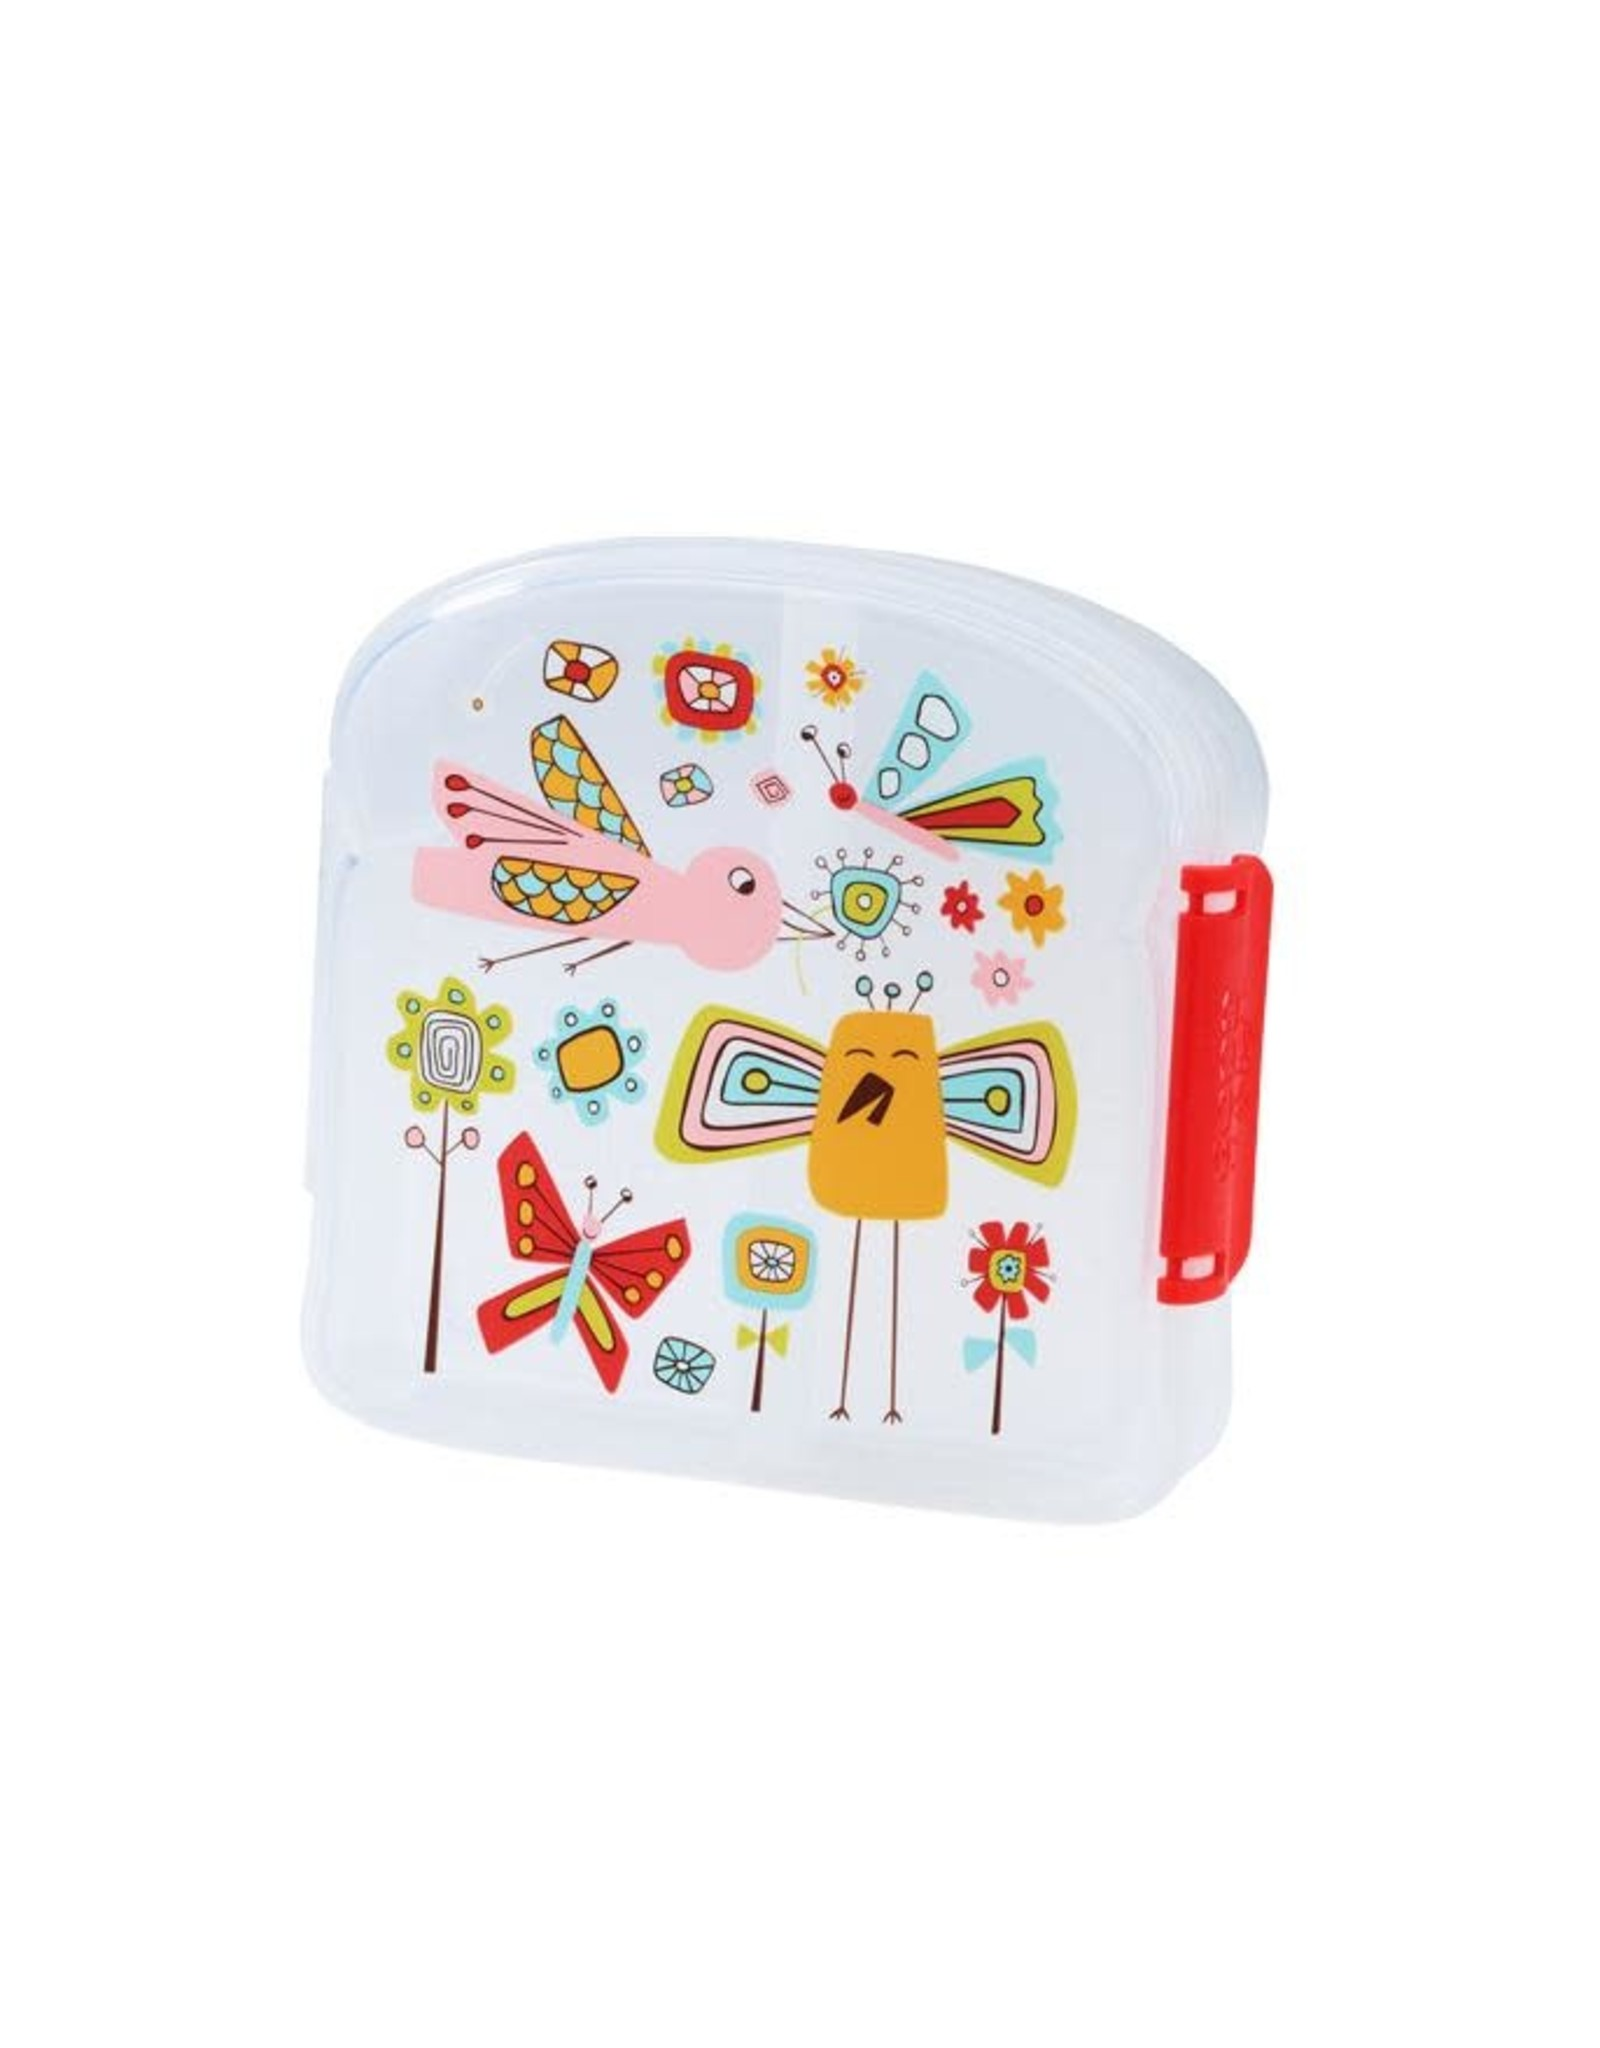 Sugarbooger Good Lunch Sandwich Box, Birds & Butterflies